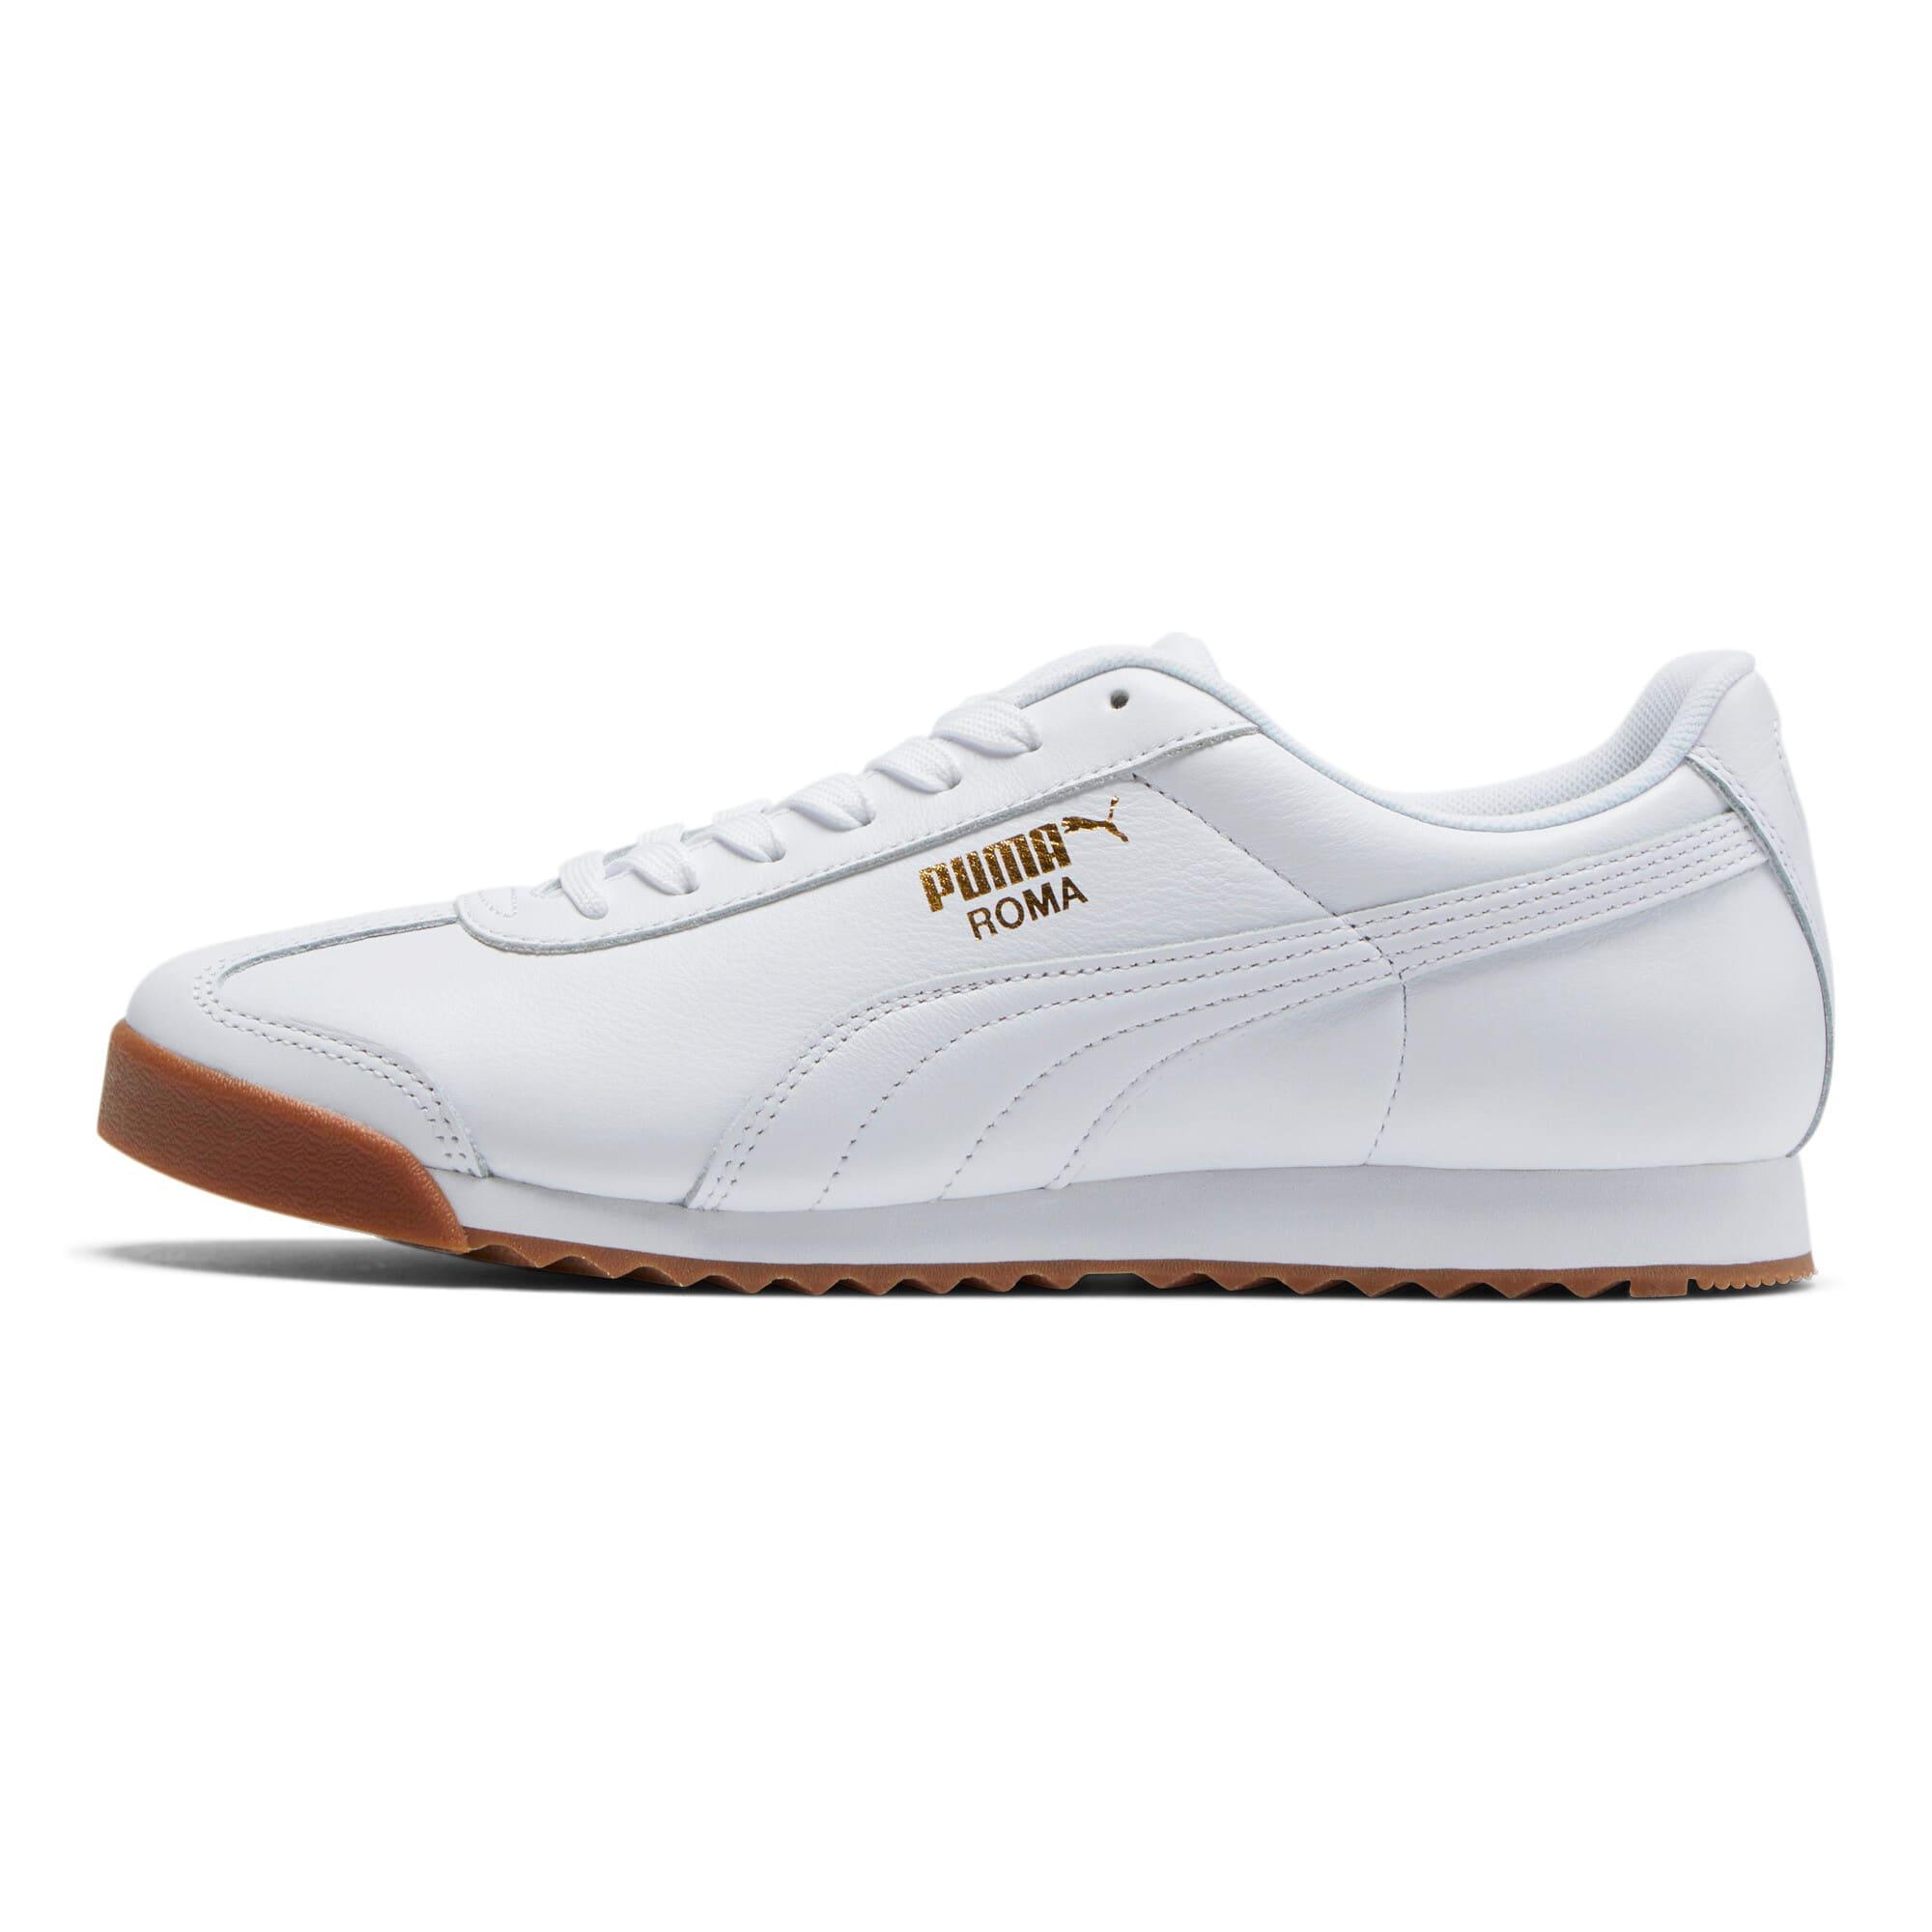 Thumbnail 1 of Roma Classic Gum Sneakers, Puma White-Puma Team Gold, medium